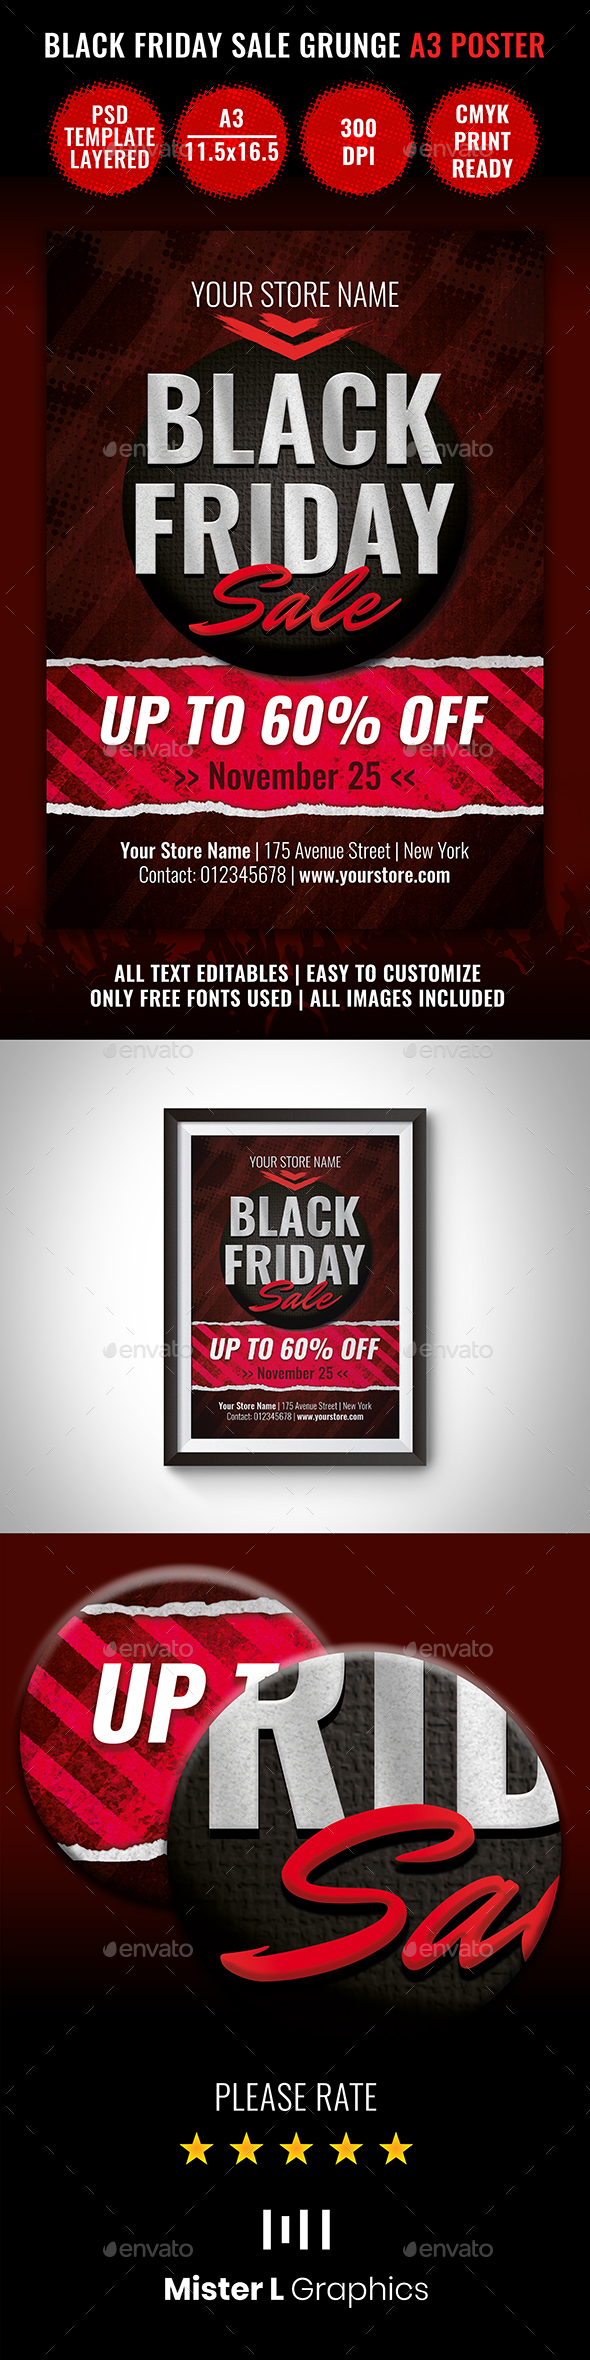 Black Friday Sale - Commerce Flyers